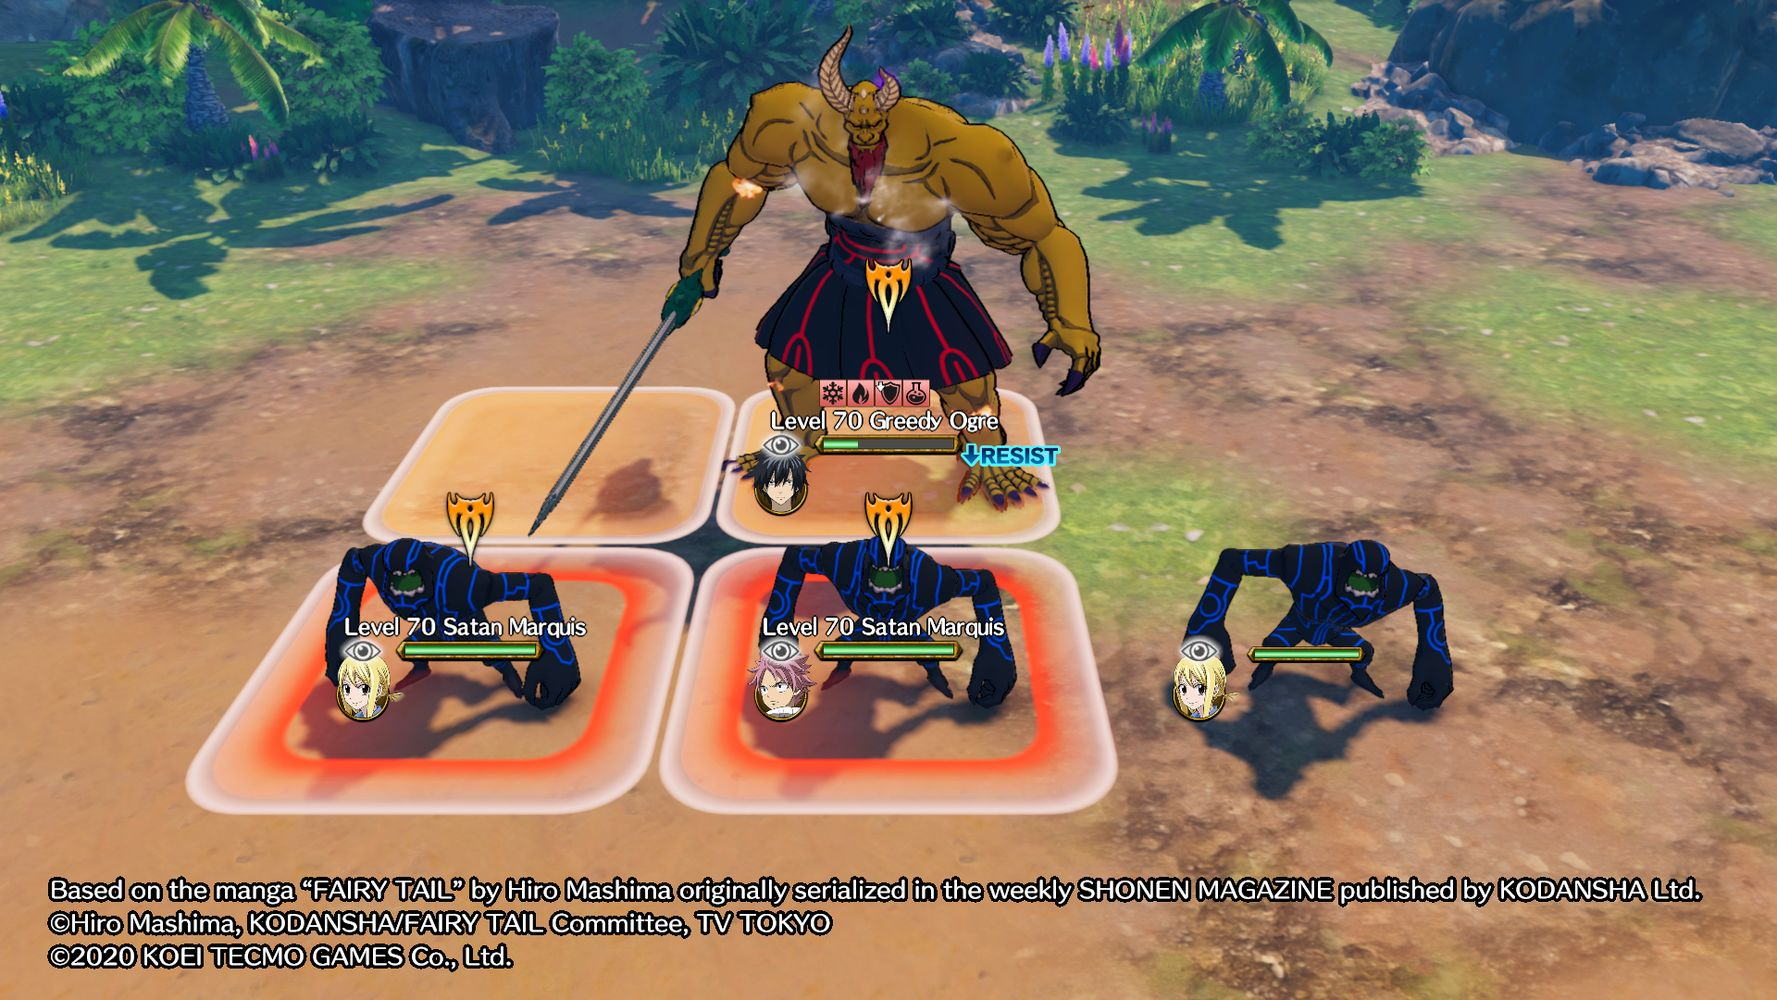 FAIRY TAIL - JRPG di GUST per PS4, Nintendo Switch e PC